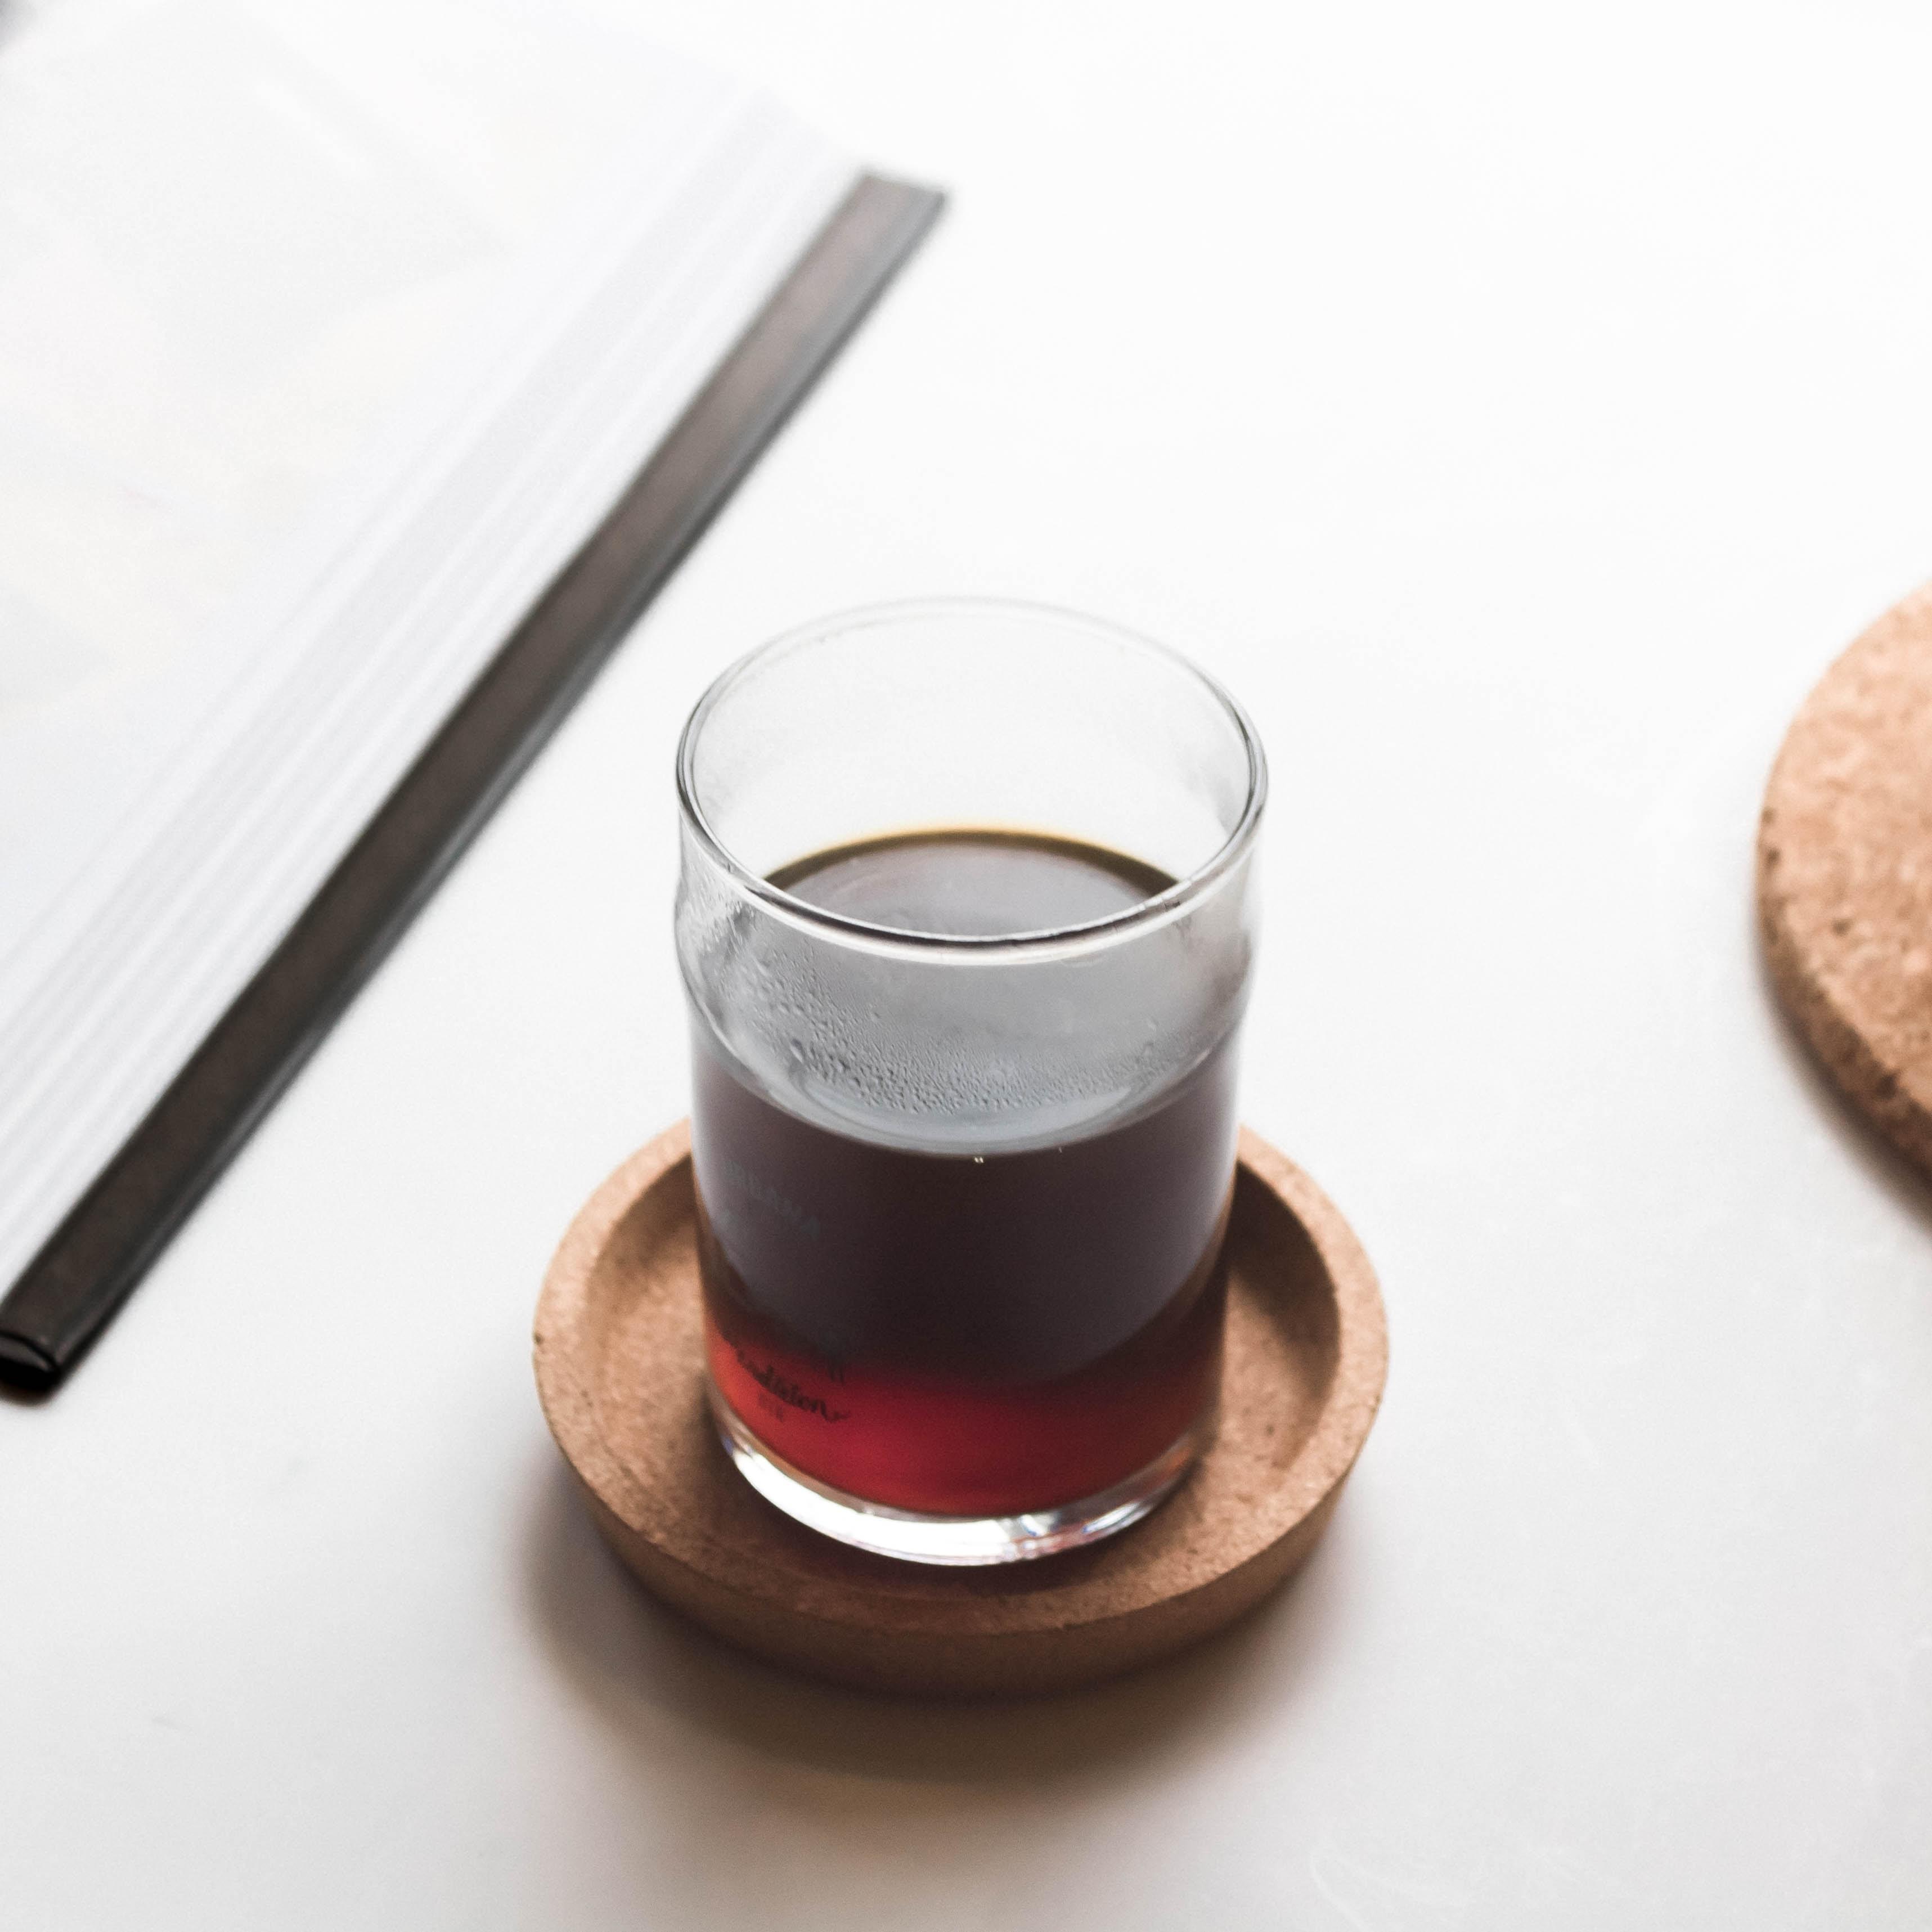 liquid in pint glass